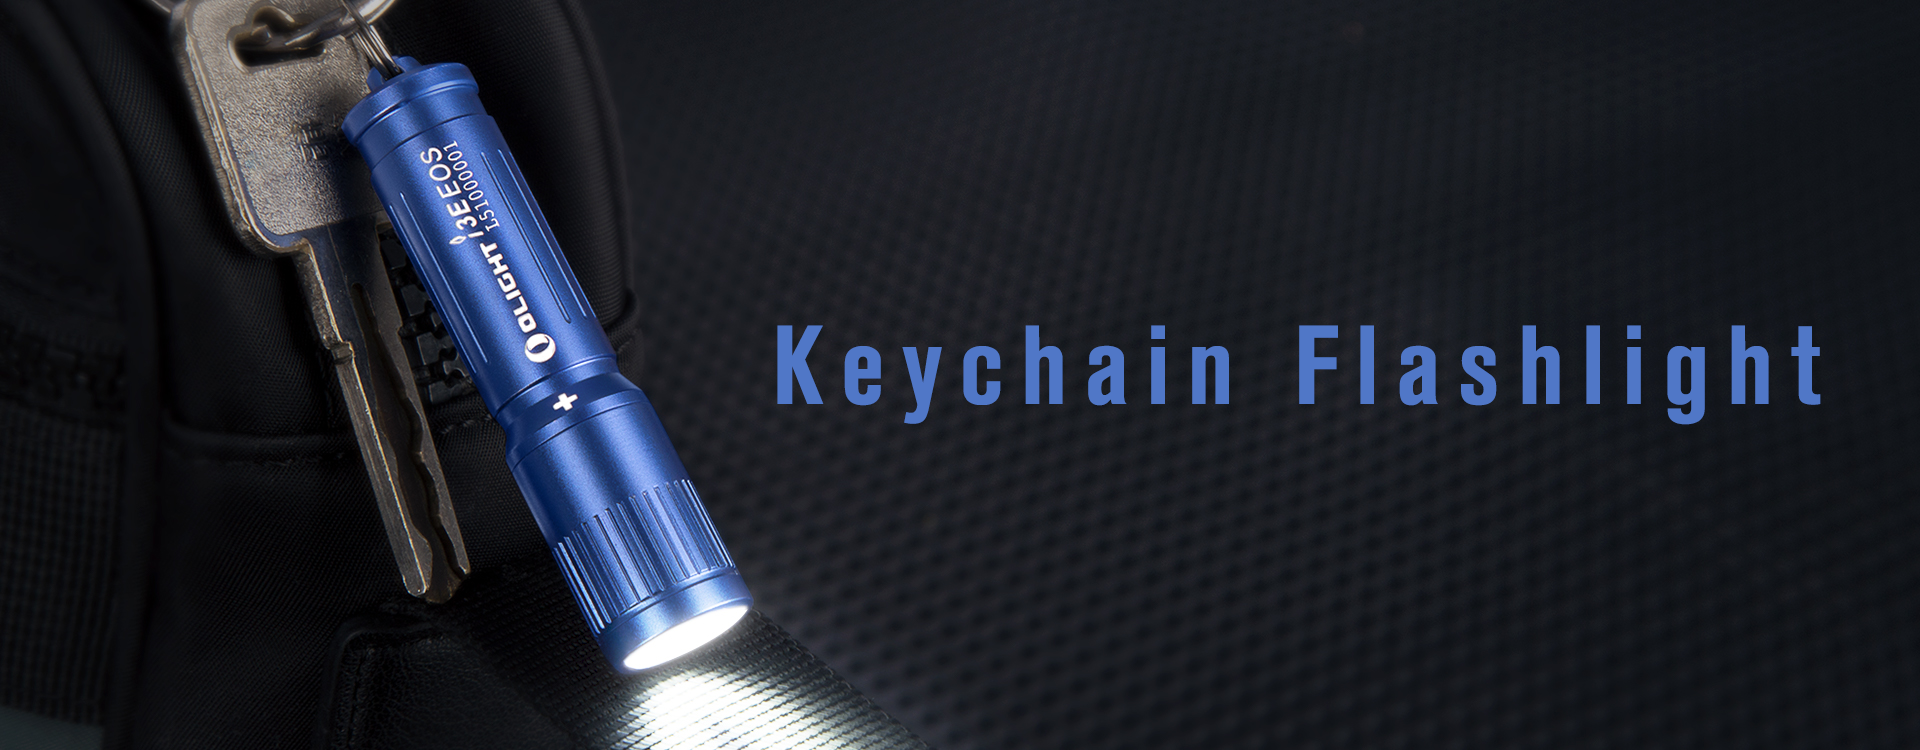 Compact Yet Powerful: Olight's Keychain Flashlight Evolution